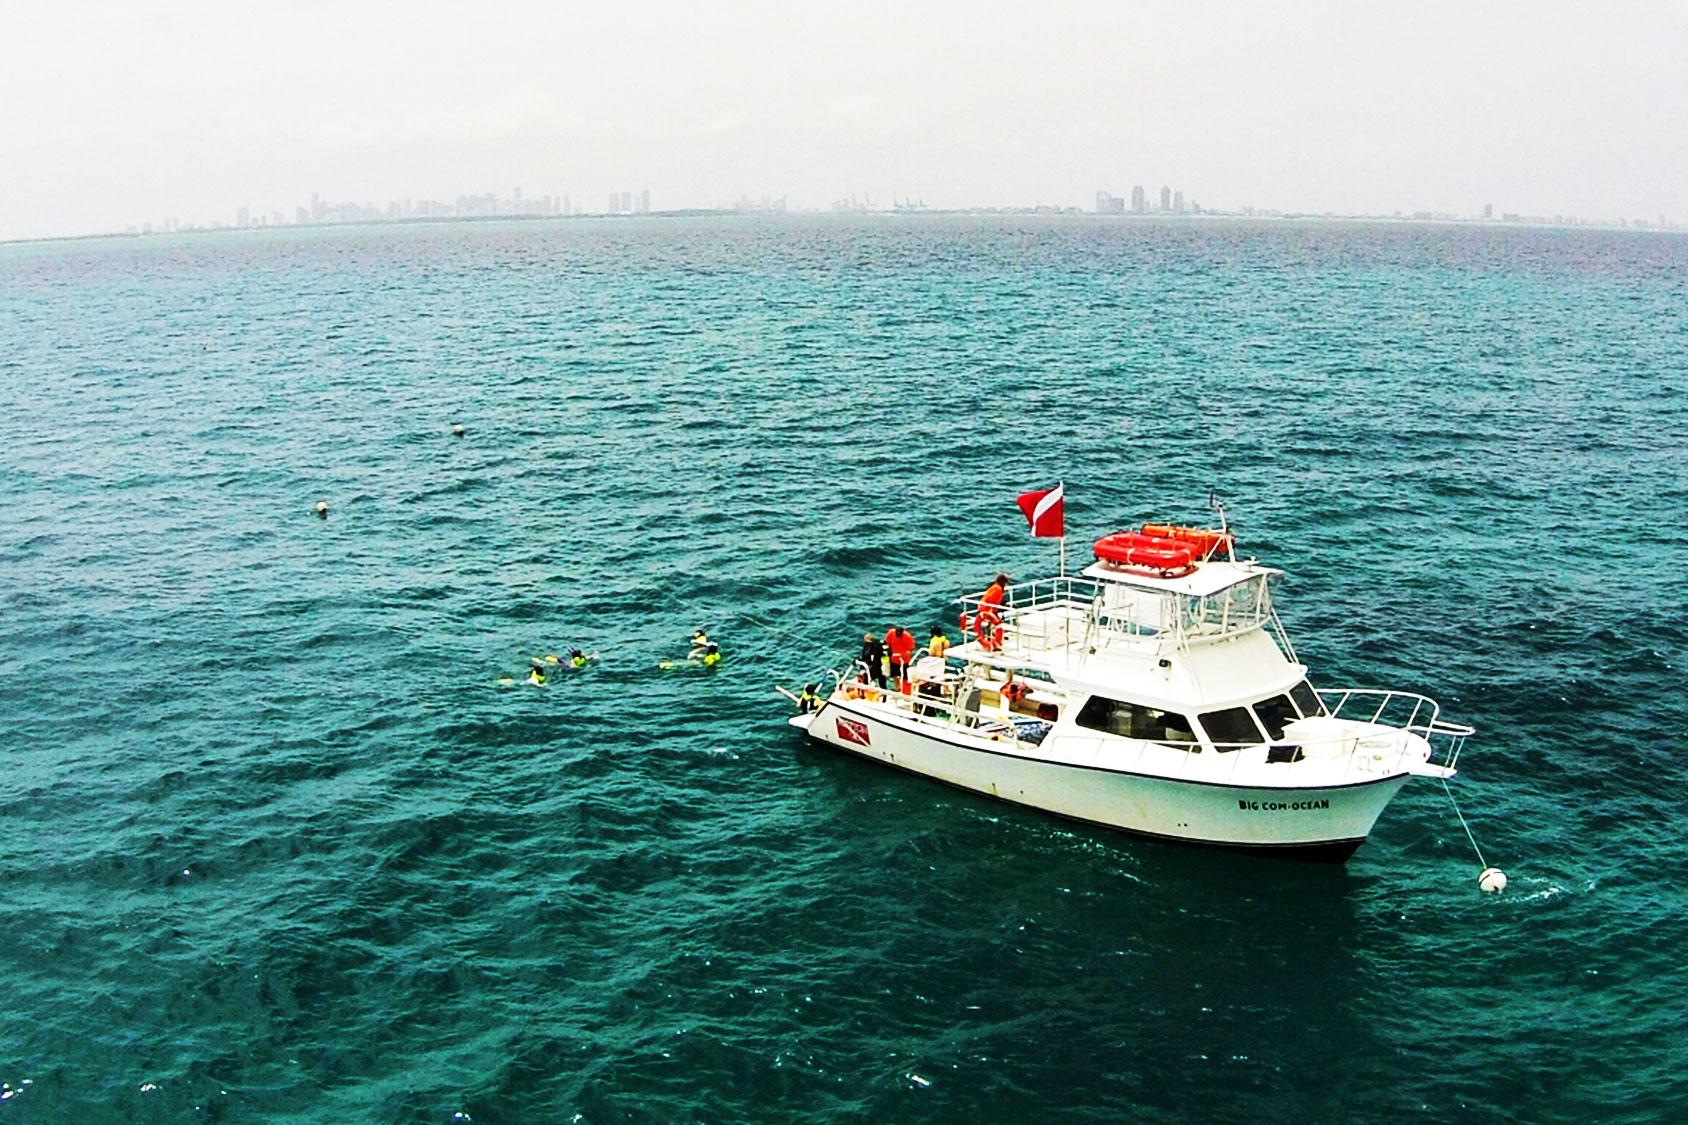 deco-diver-boat-aerial